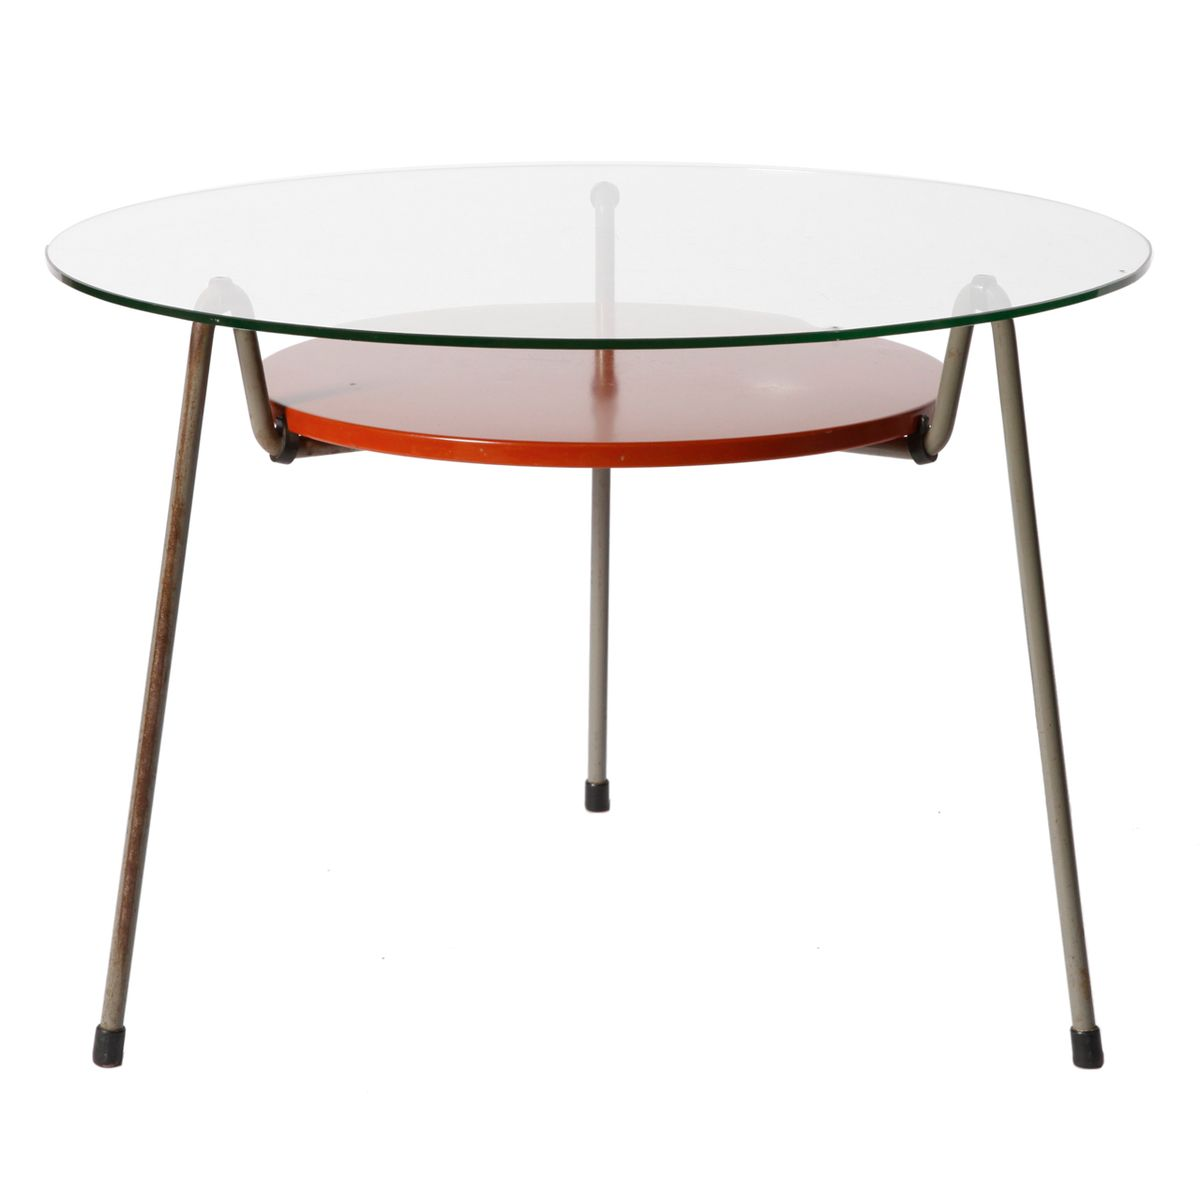 Ikea Magiker Coffee Table Original Price Interessante Ideen F R Die Gestaltung